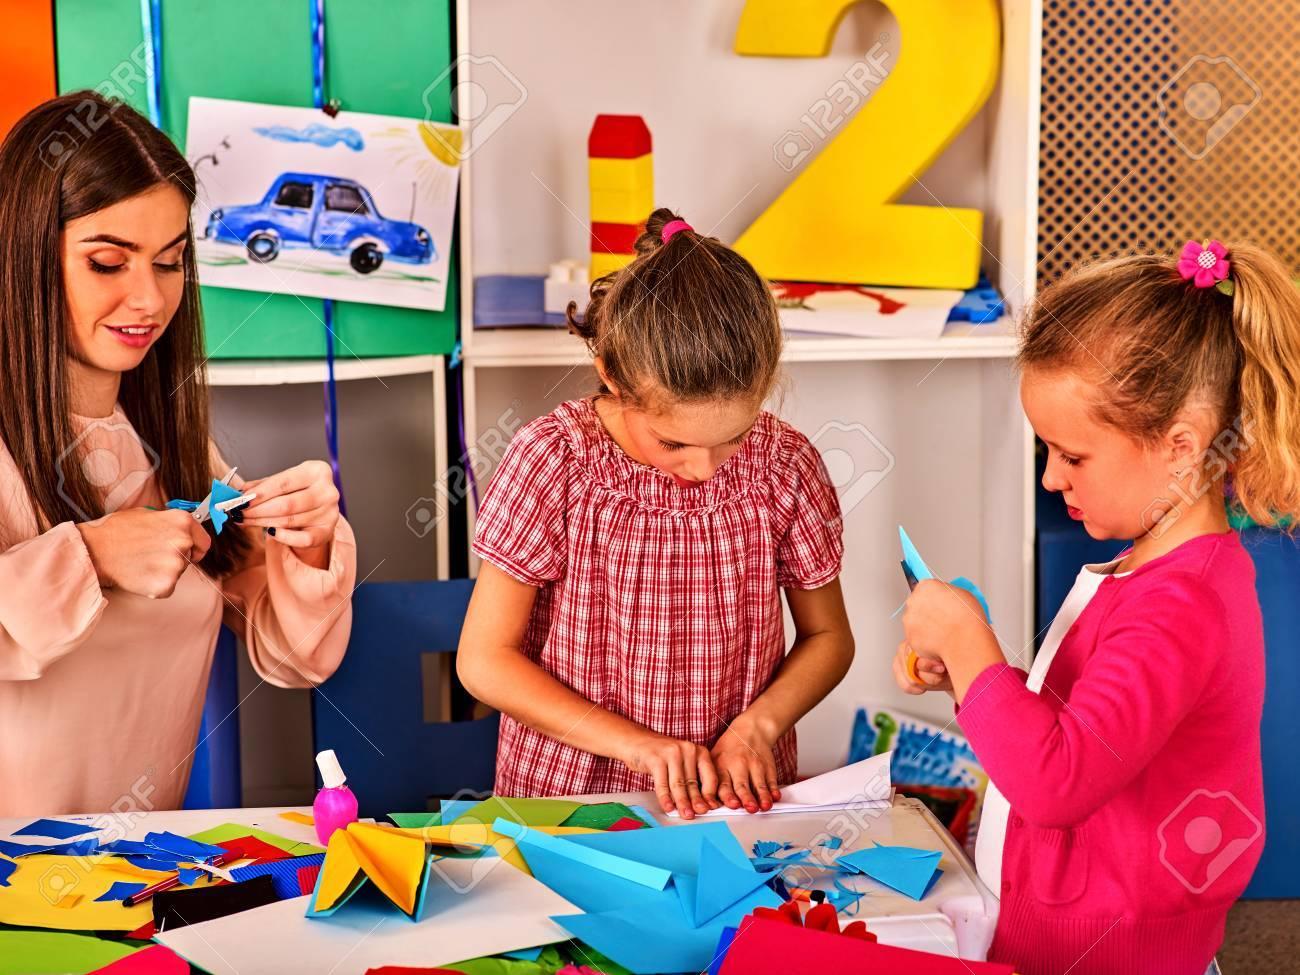 Paper Craft Work For Children Dreams Flight Of Child In